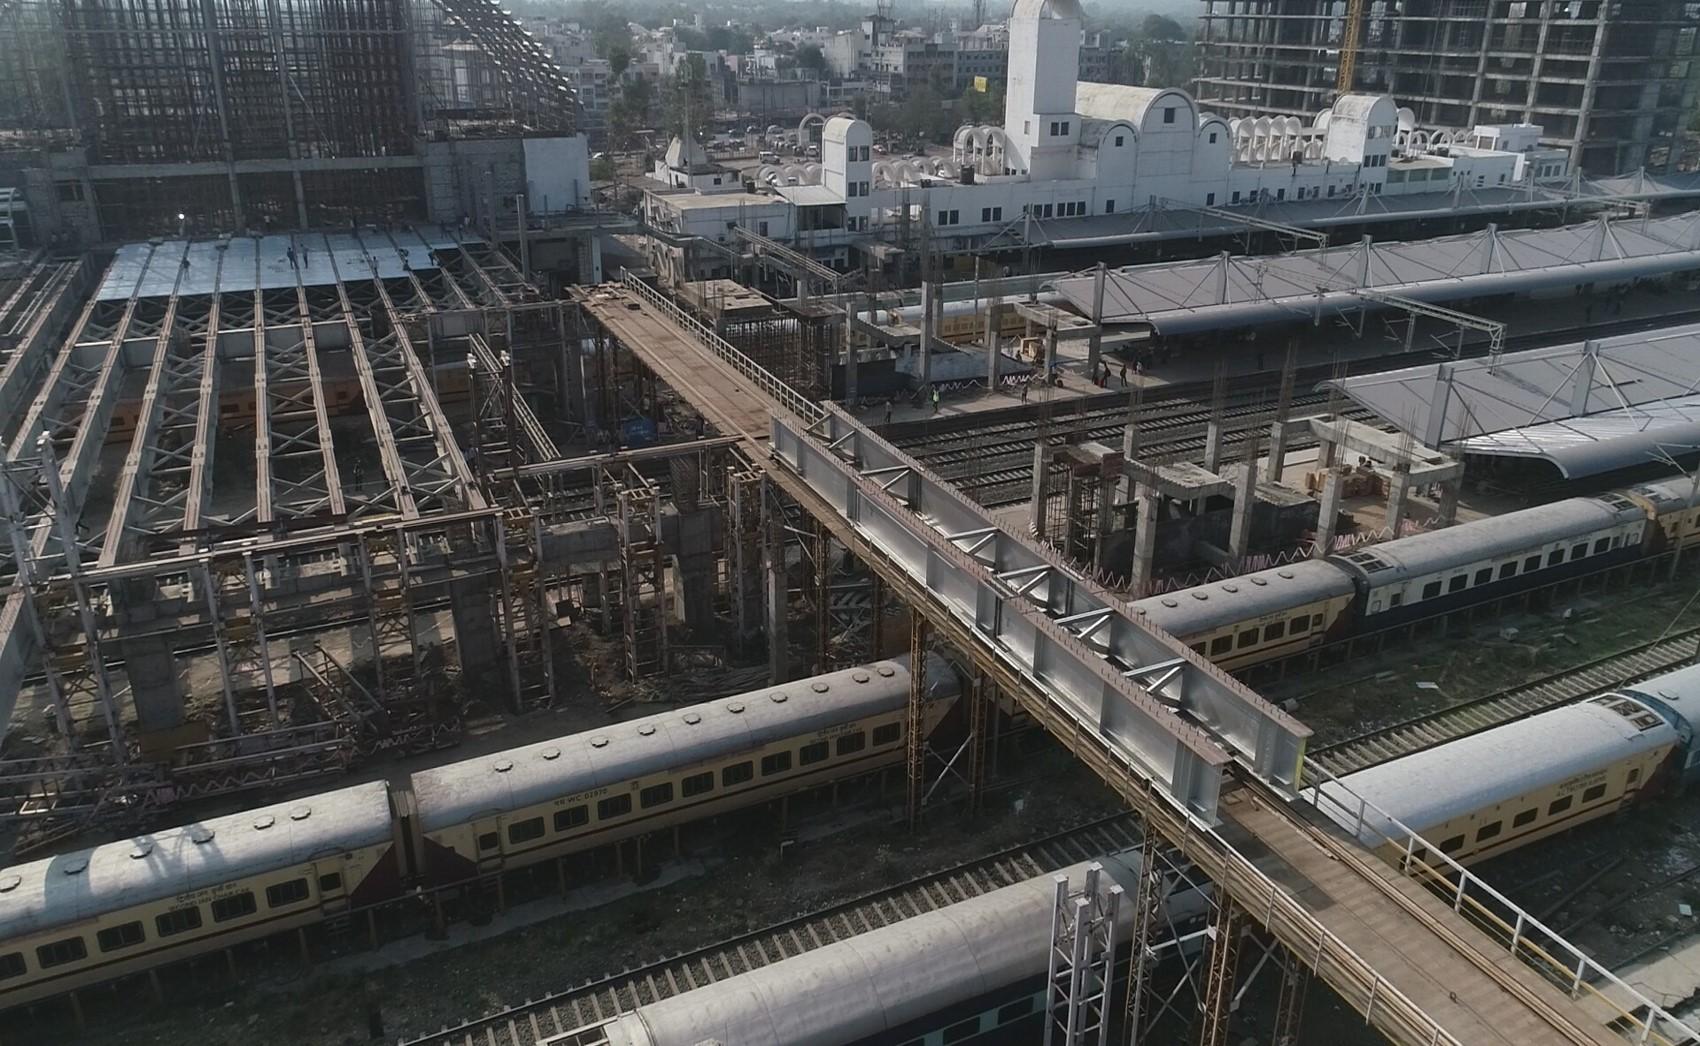 Girder launching in progress at Gandhinagar Railway Station